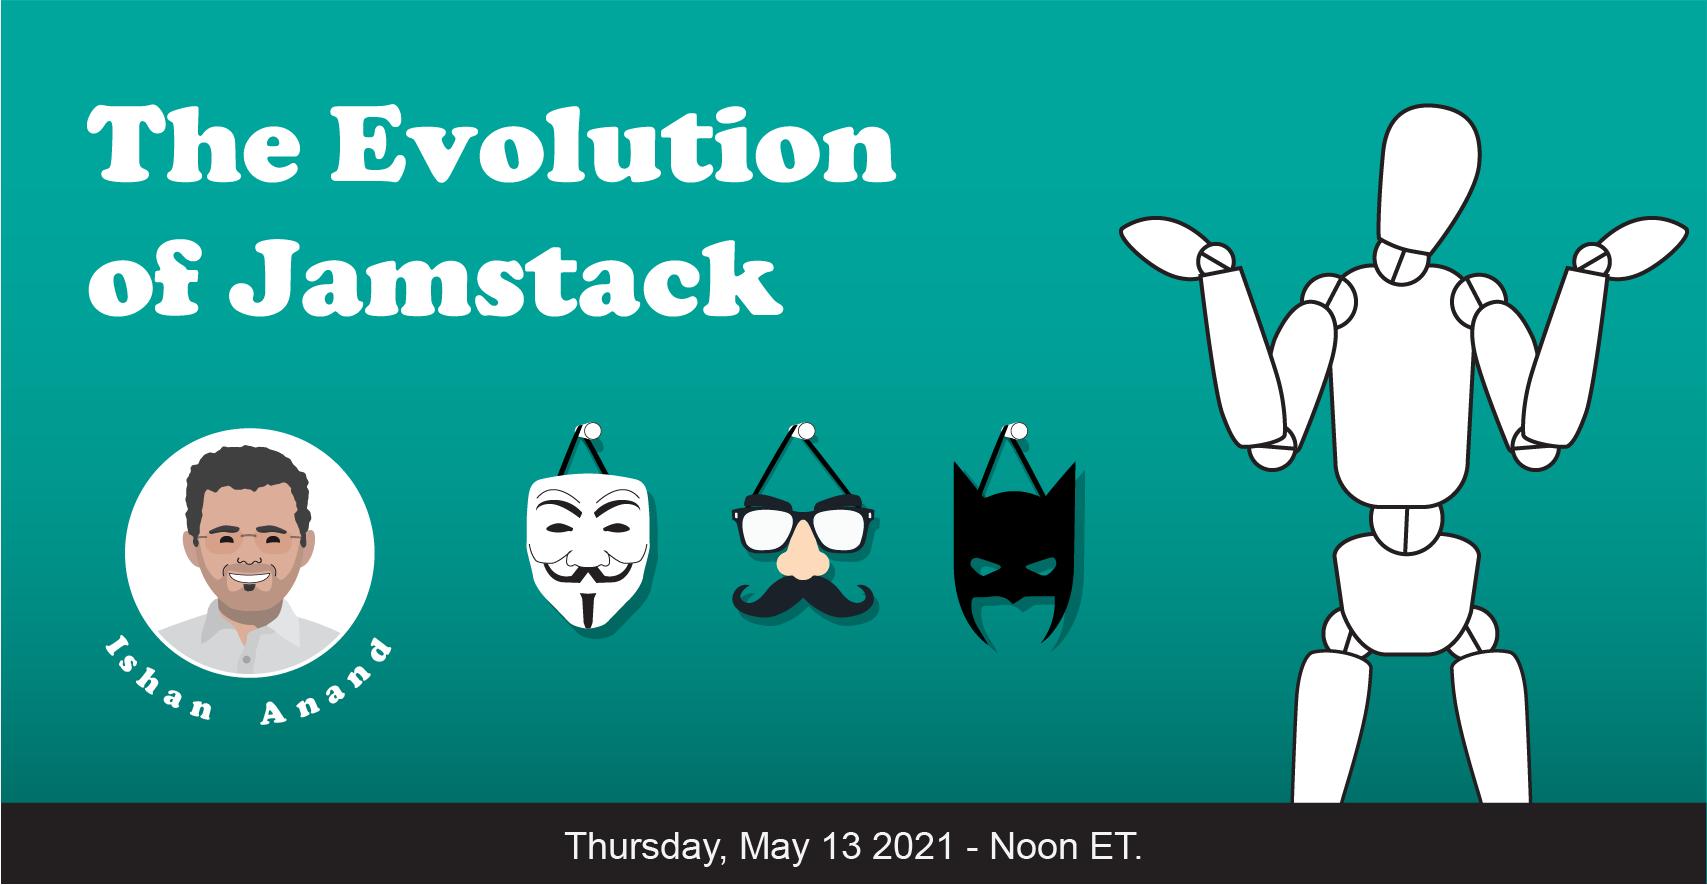 Banner for The Evolution of Jamstack